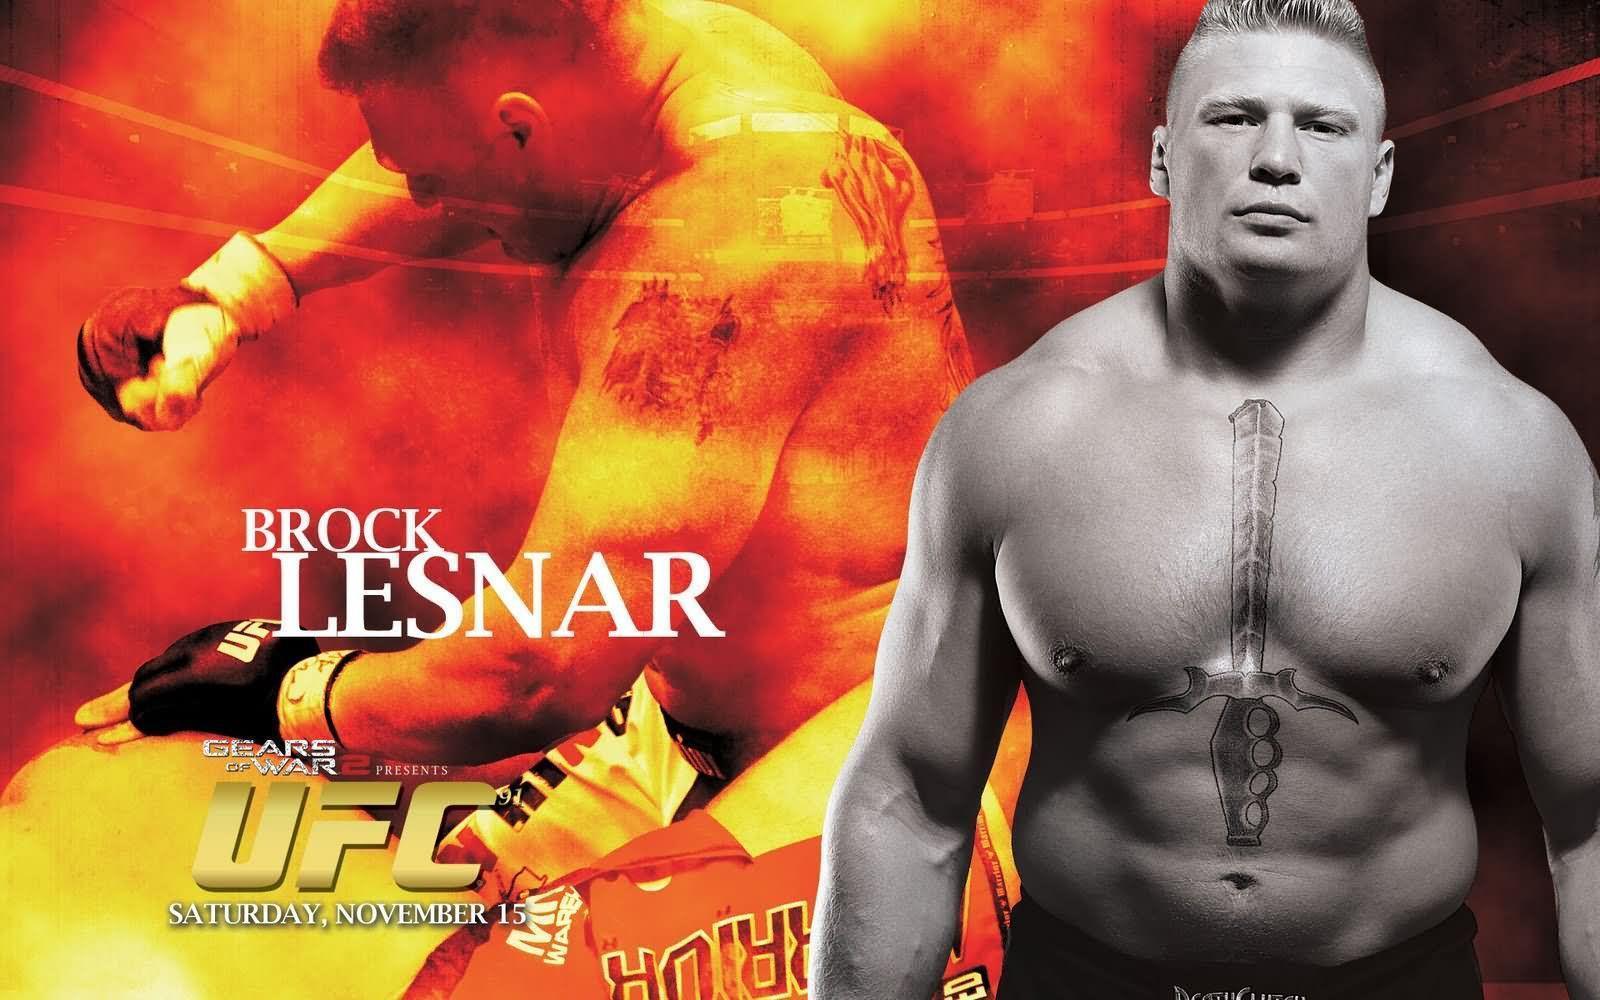 Brock Lesnar Ufc Wallpapers Wallpaper Cave